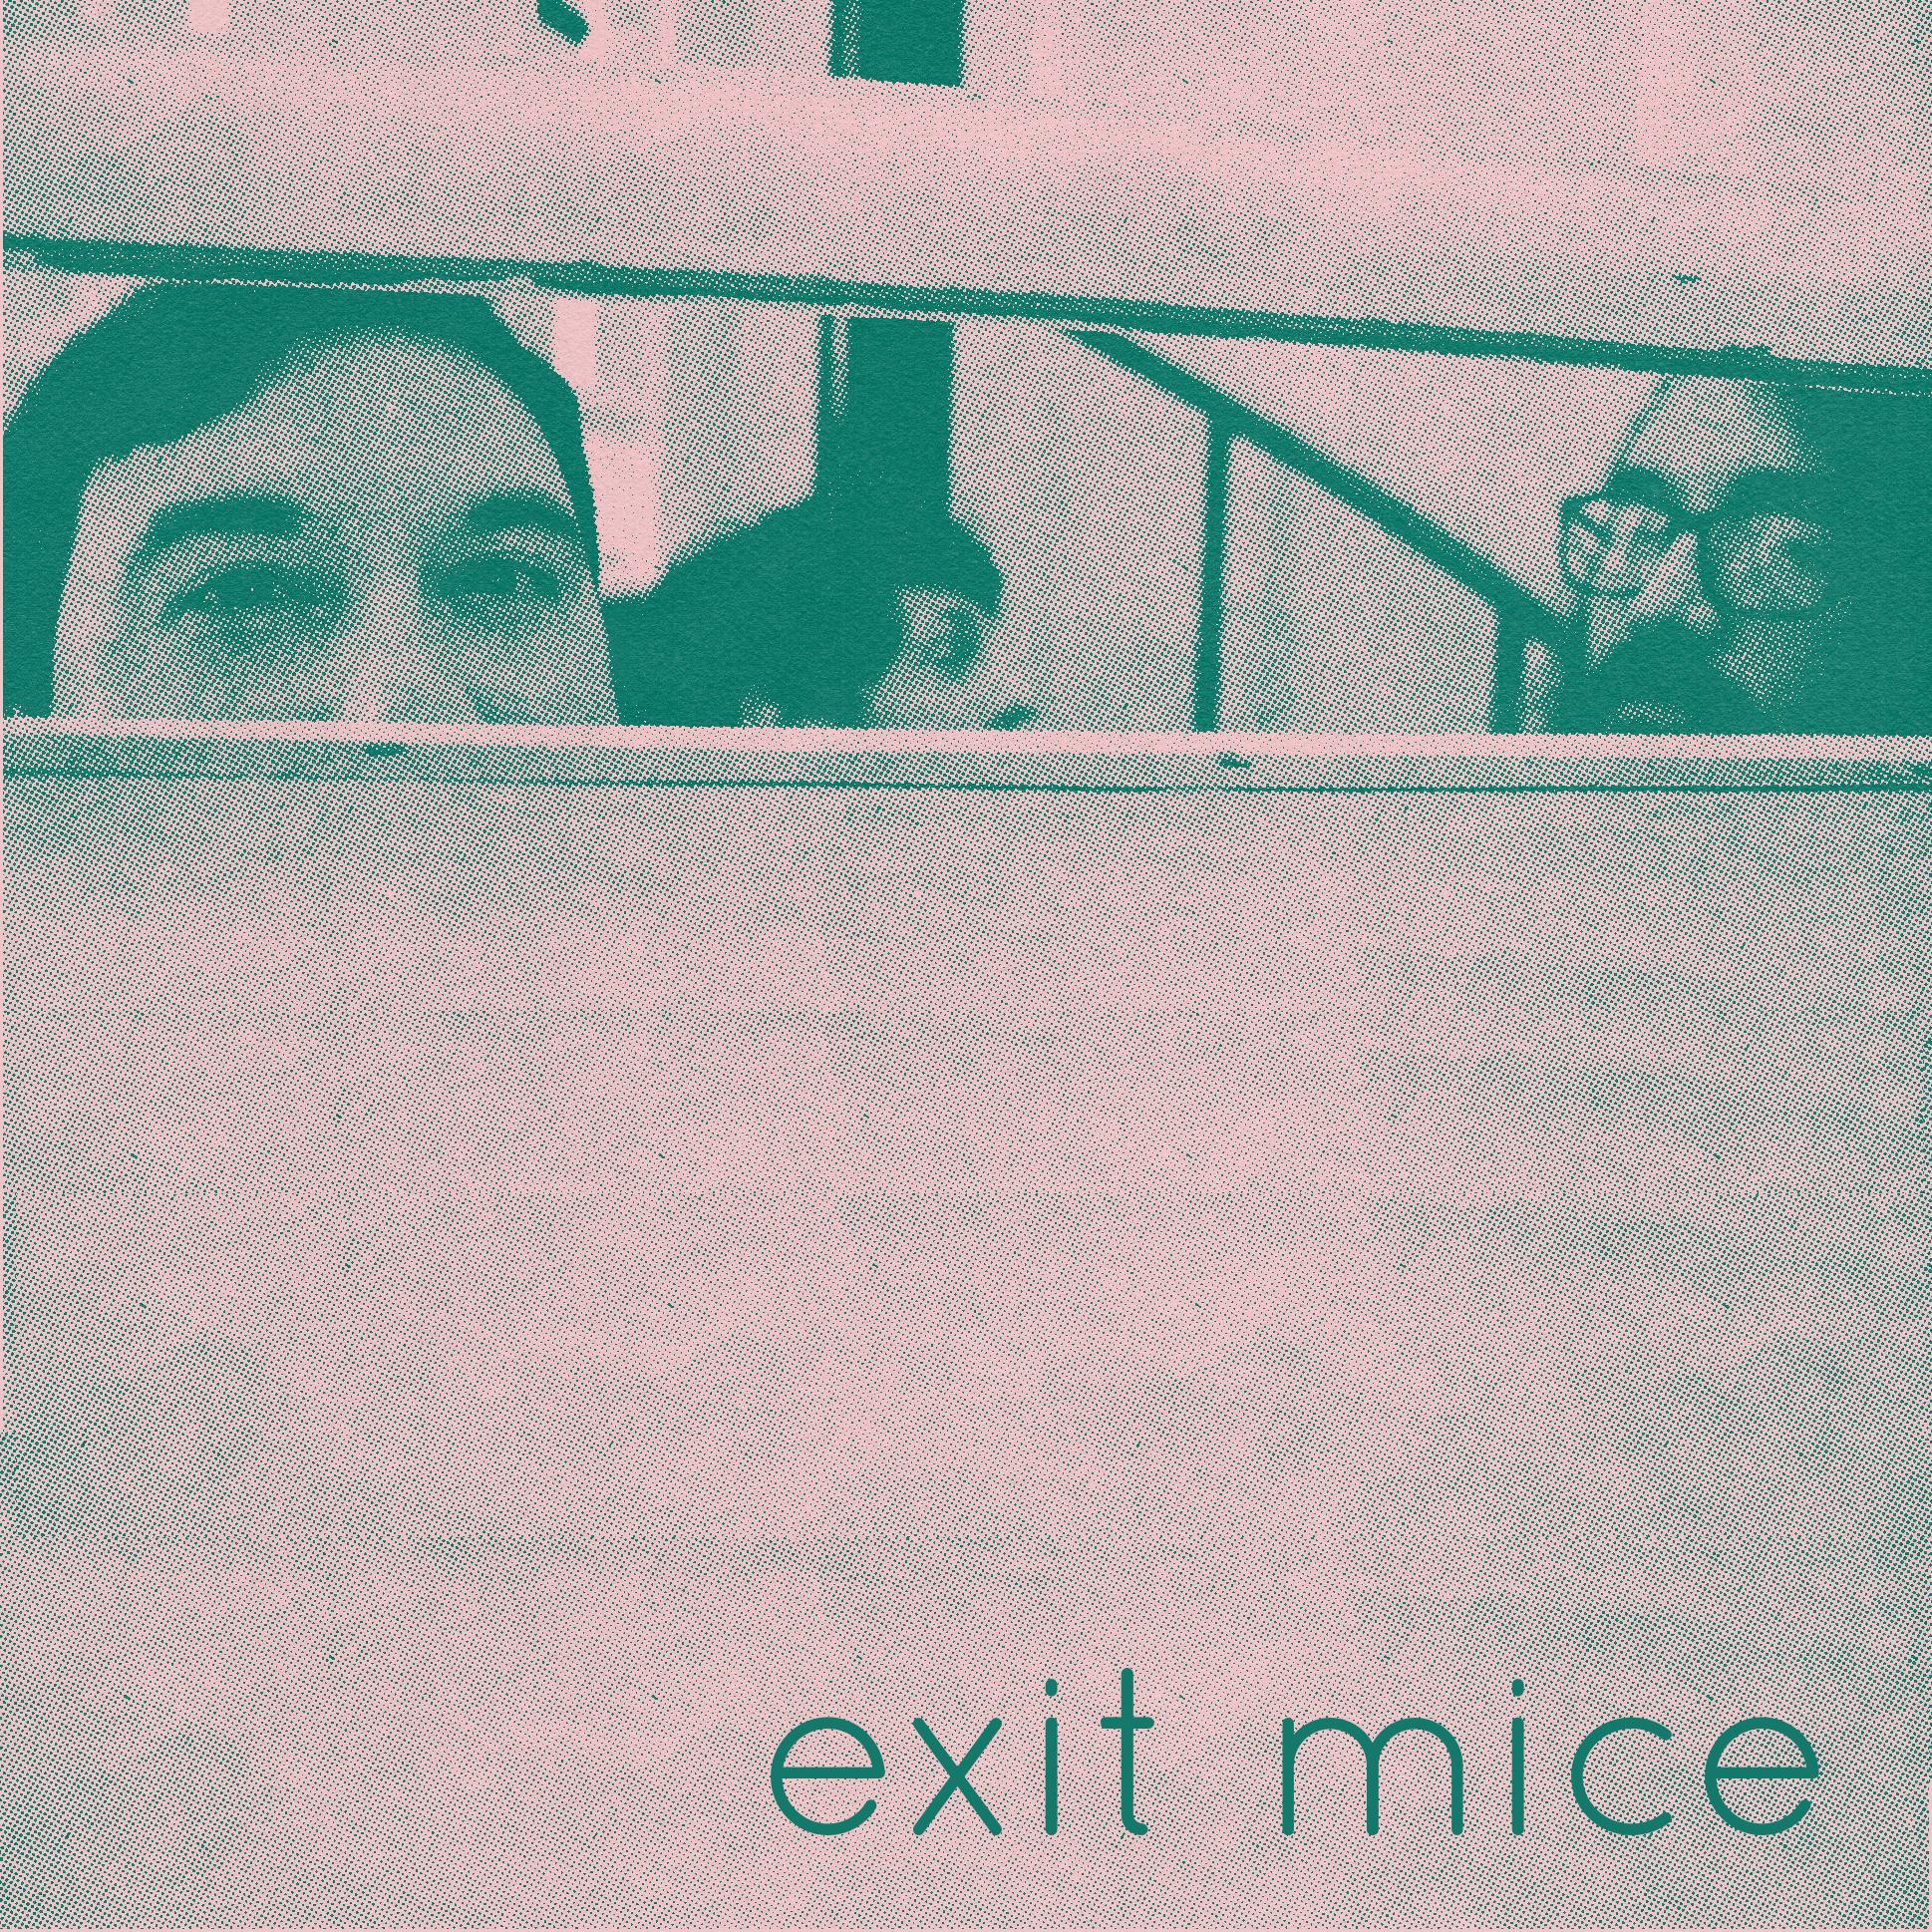 exit mice